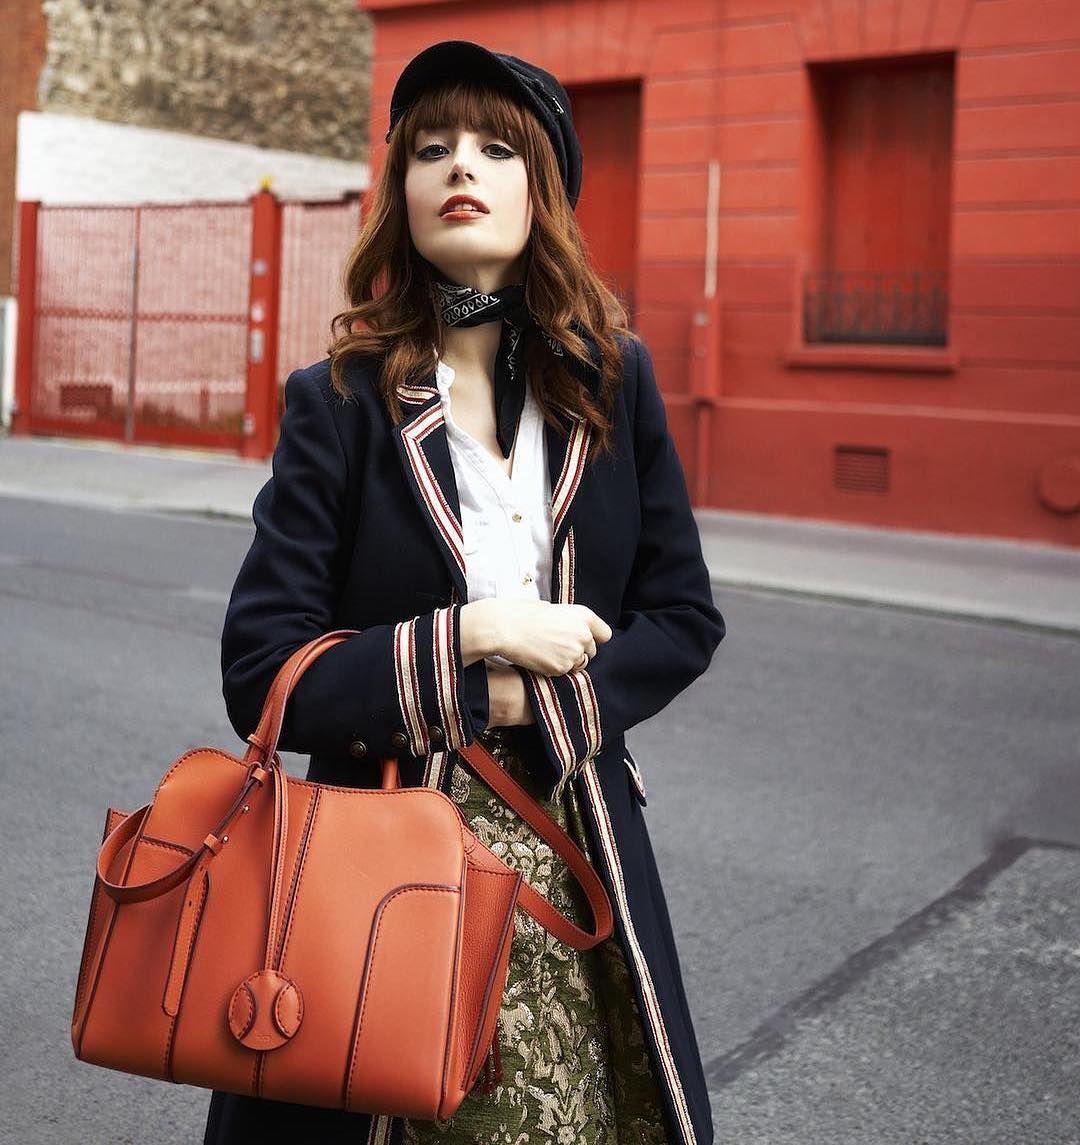 Queen Elizabeth Uses Her Handbag As a Secret Code | Travel ...